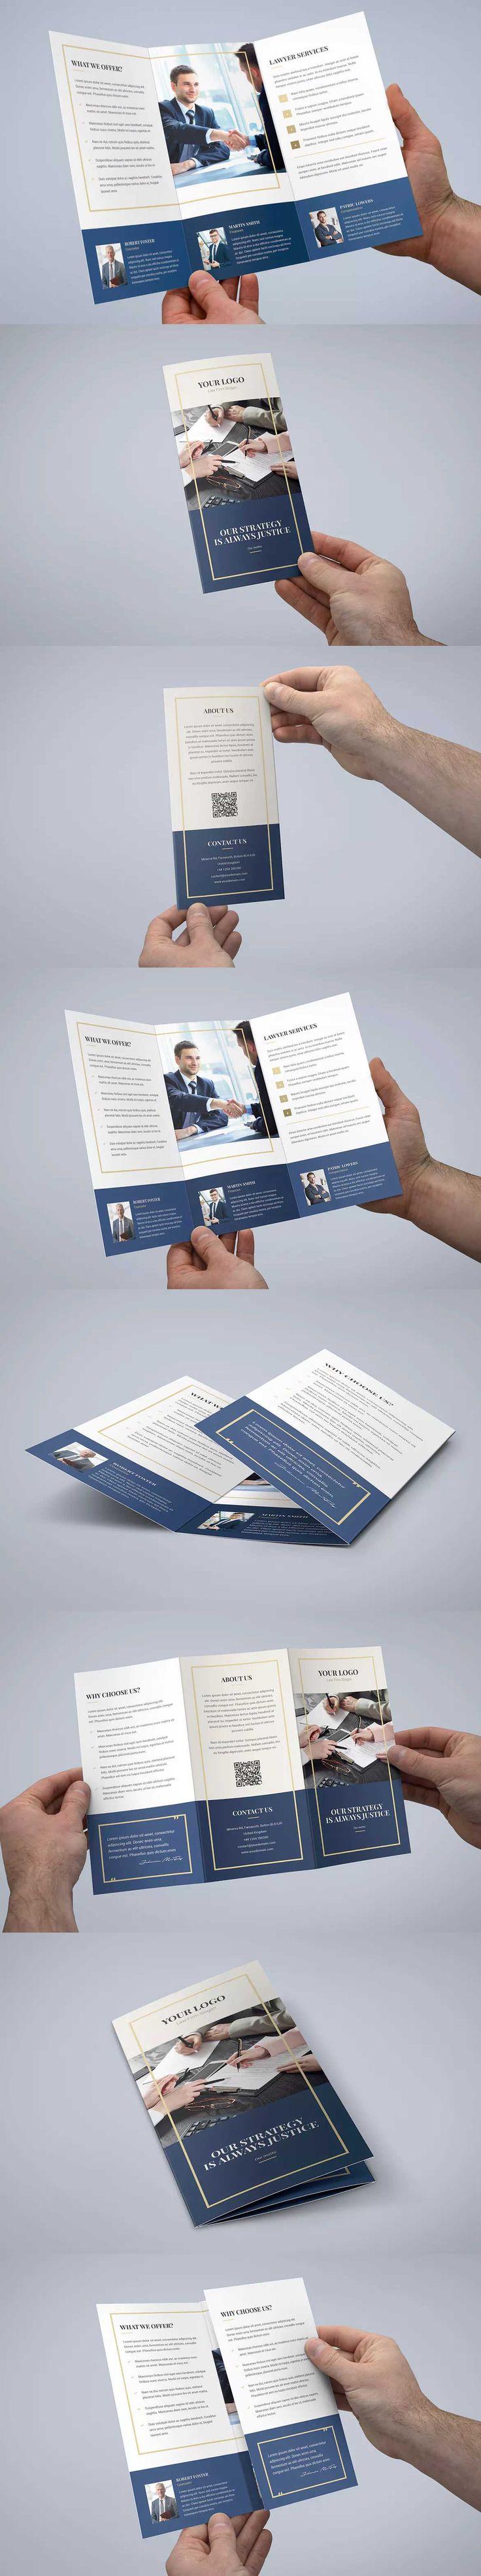 Law Firm Tri Fold Brochure Template PSD